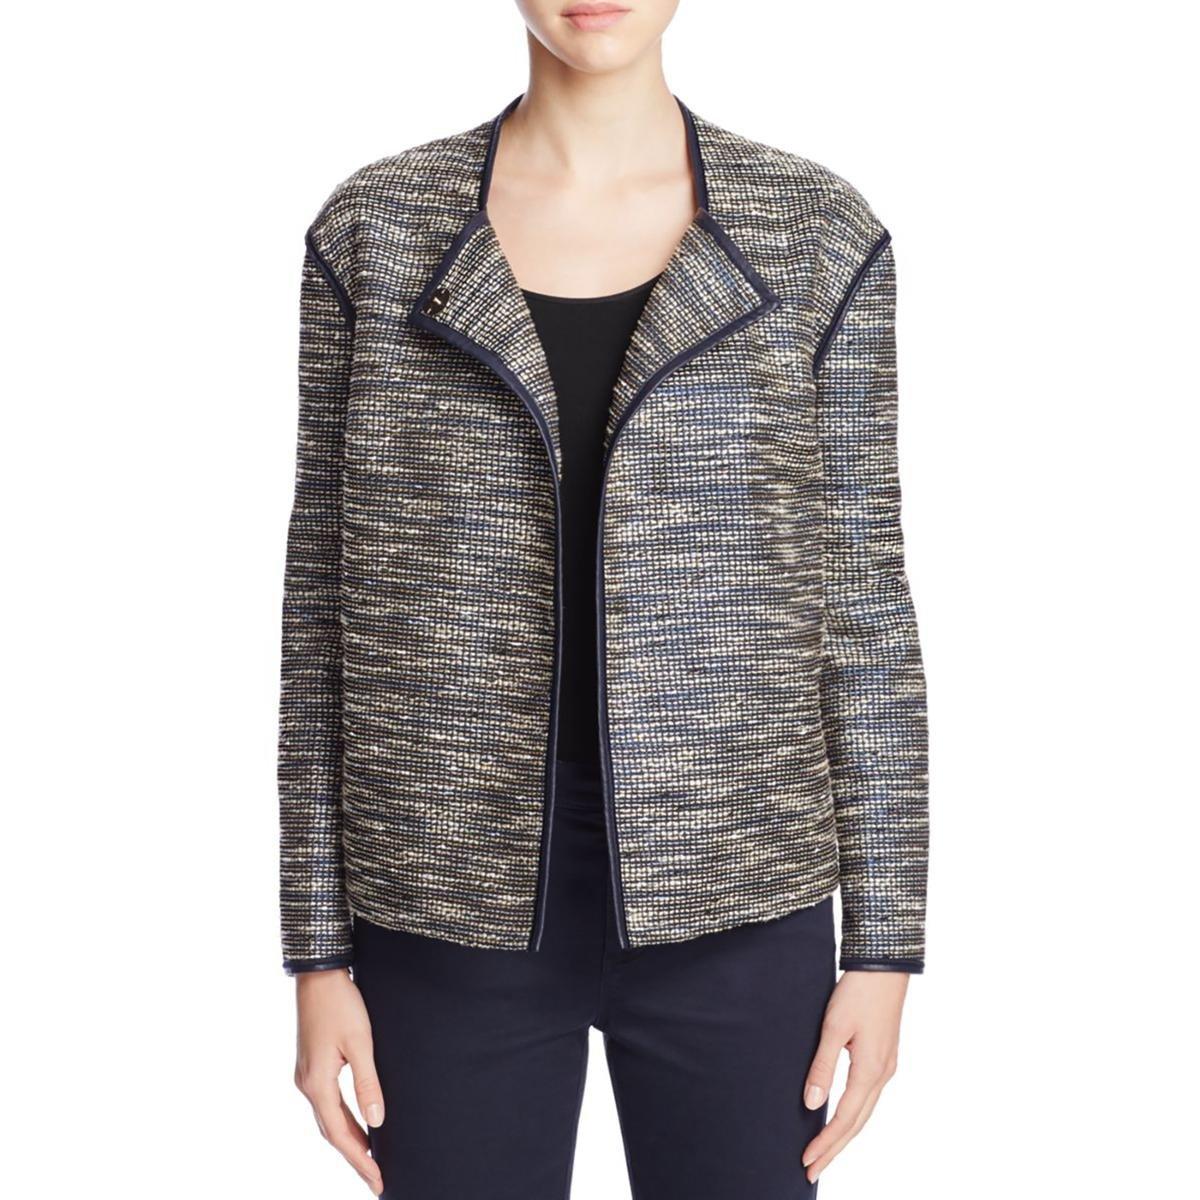 Lafayette 148 Womens Dane Textured Metallic Jacket XL